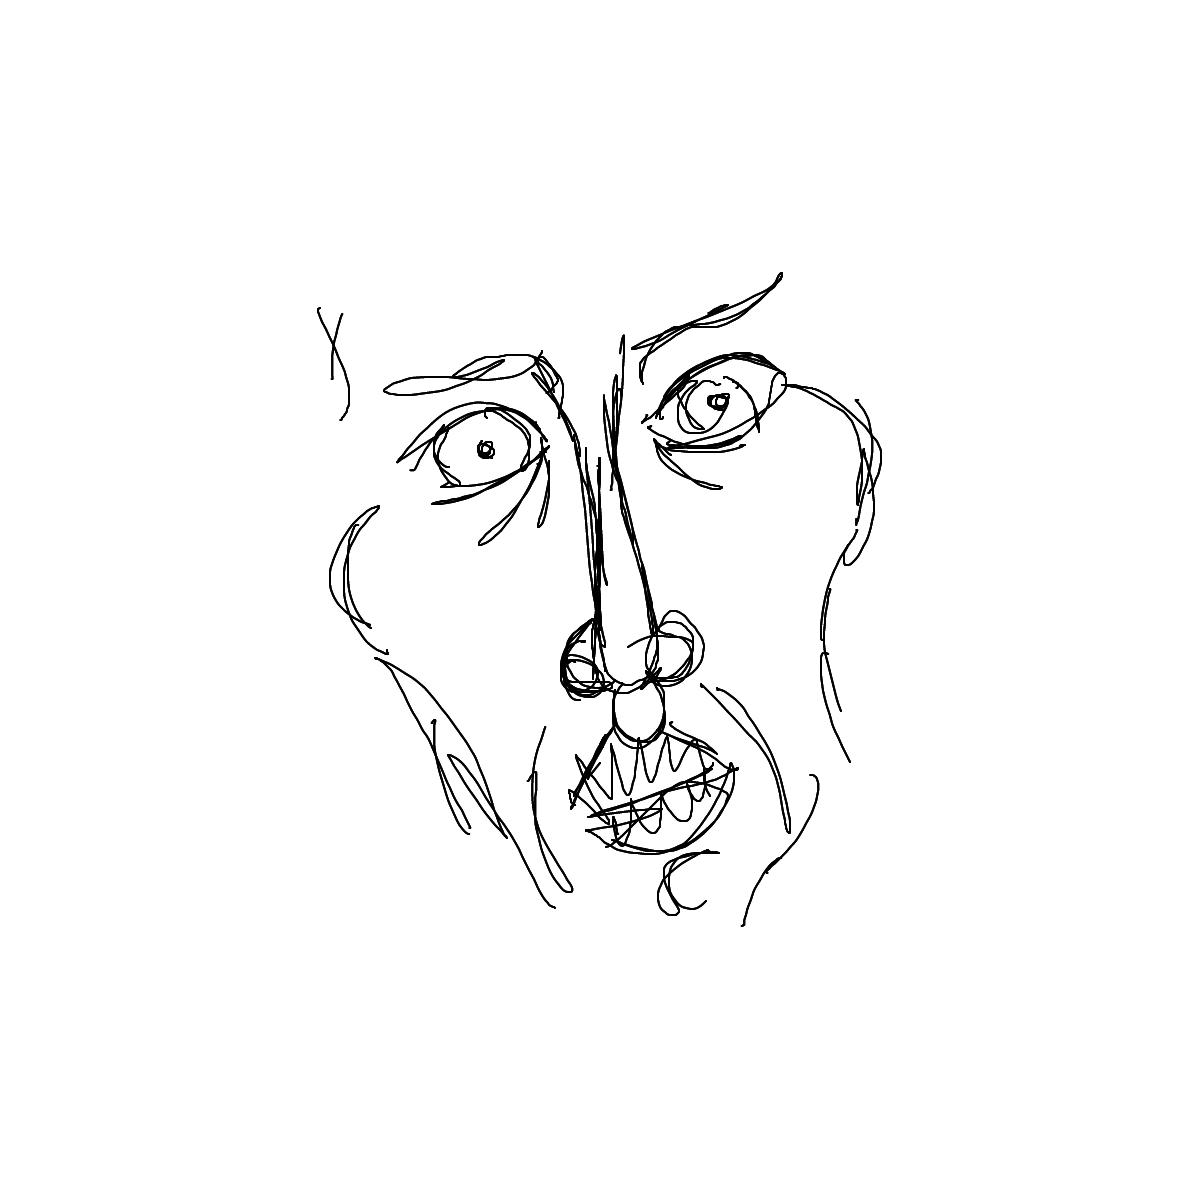 BAAAM drawing#22307 lat:48.8727531433105500lng: 2.3208675384521484